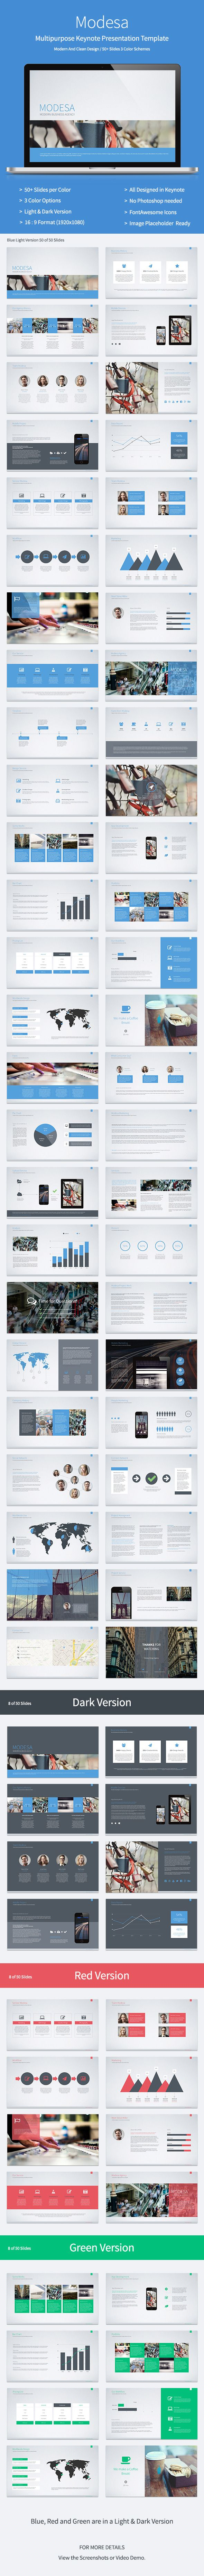 Modesa - Multipurpose Keynote Template #keynotetemplate #multipurposekeynote #presentation Download: http://graphicriver.net/item/modesa-multipurpose-keynote-template/8017338?ref=ksioks